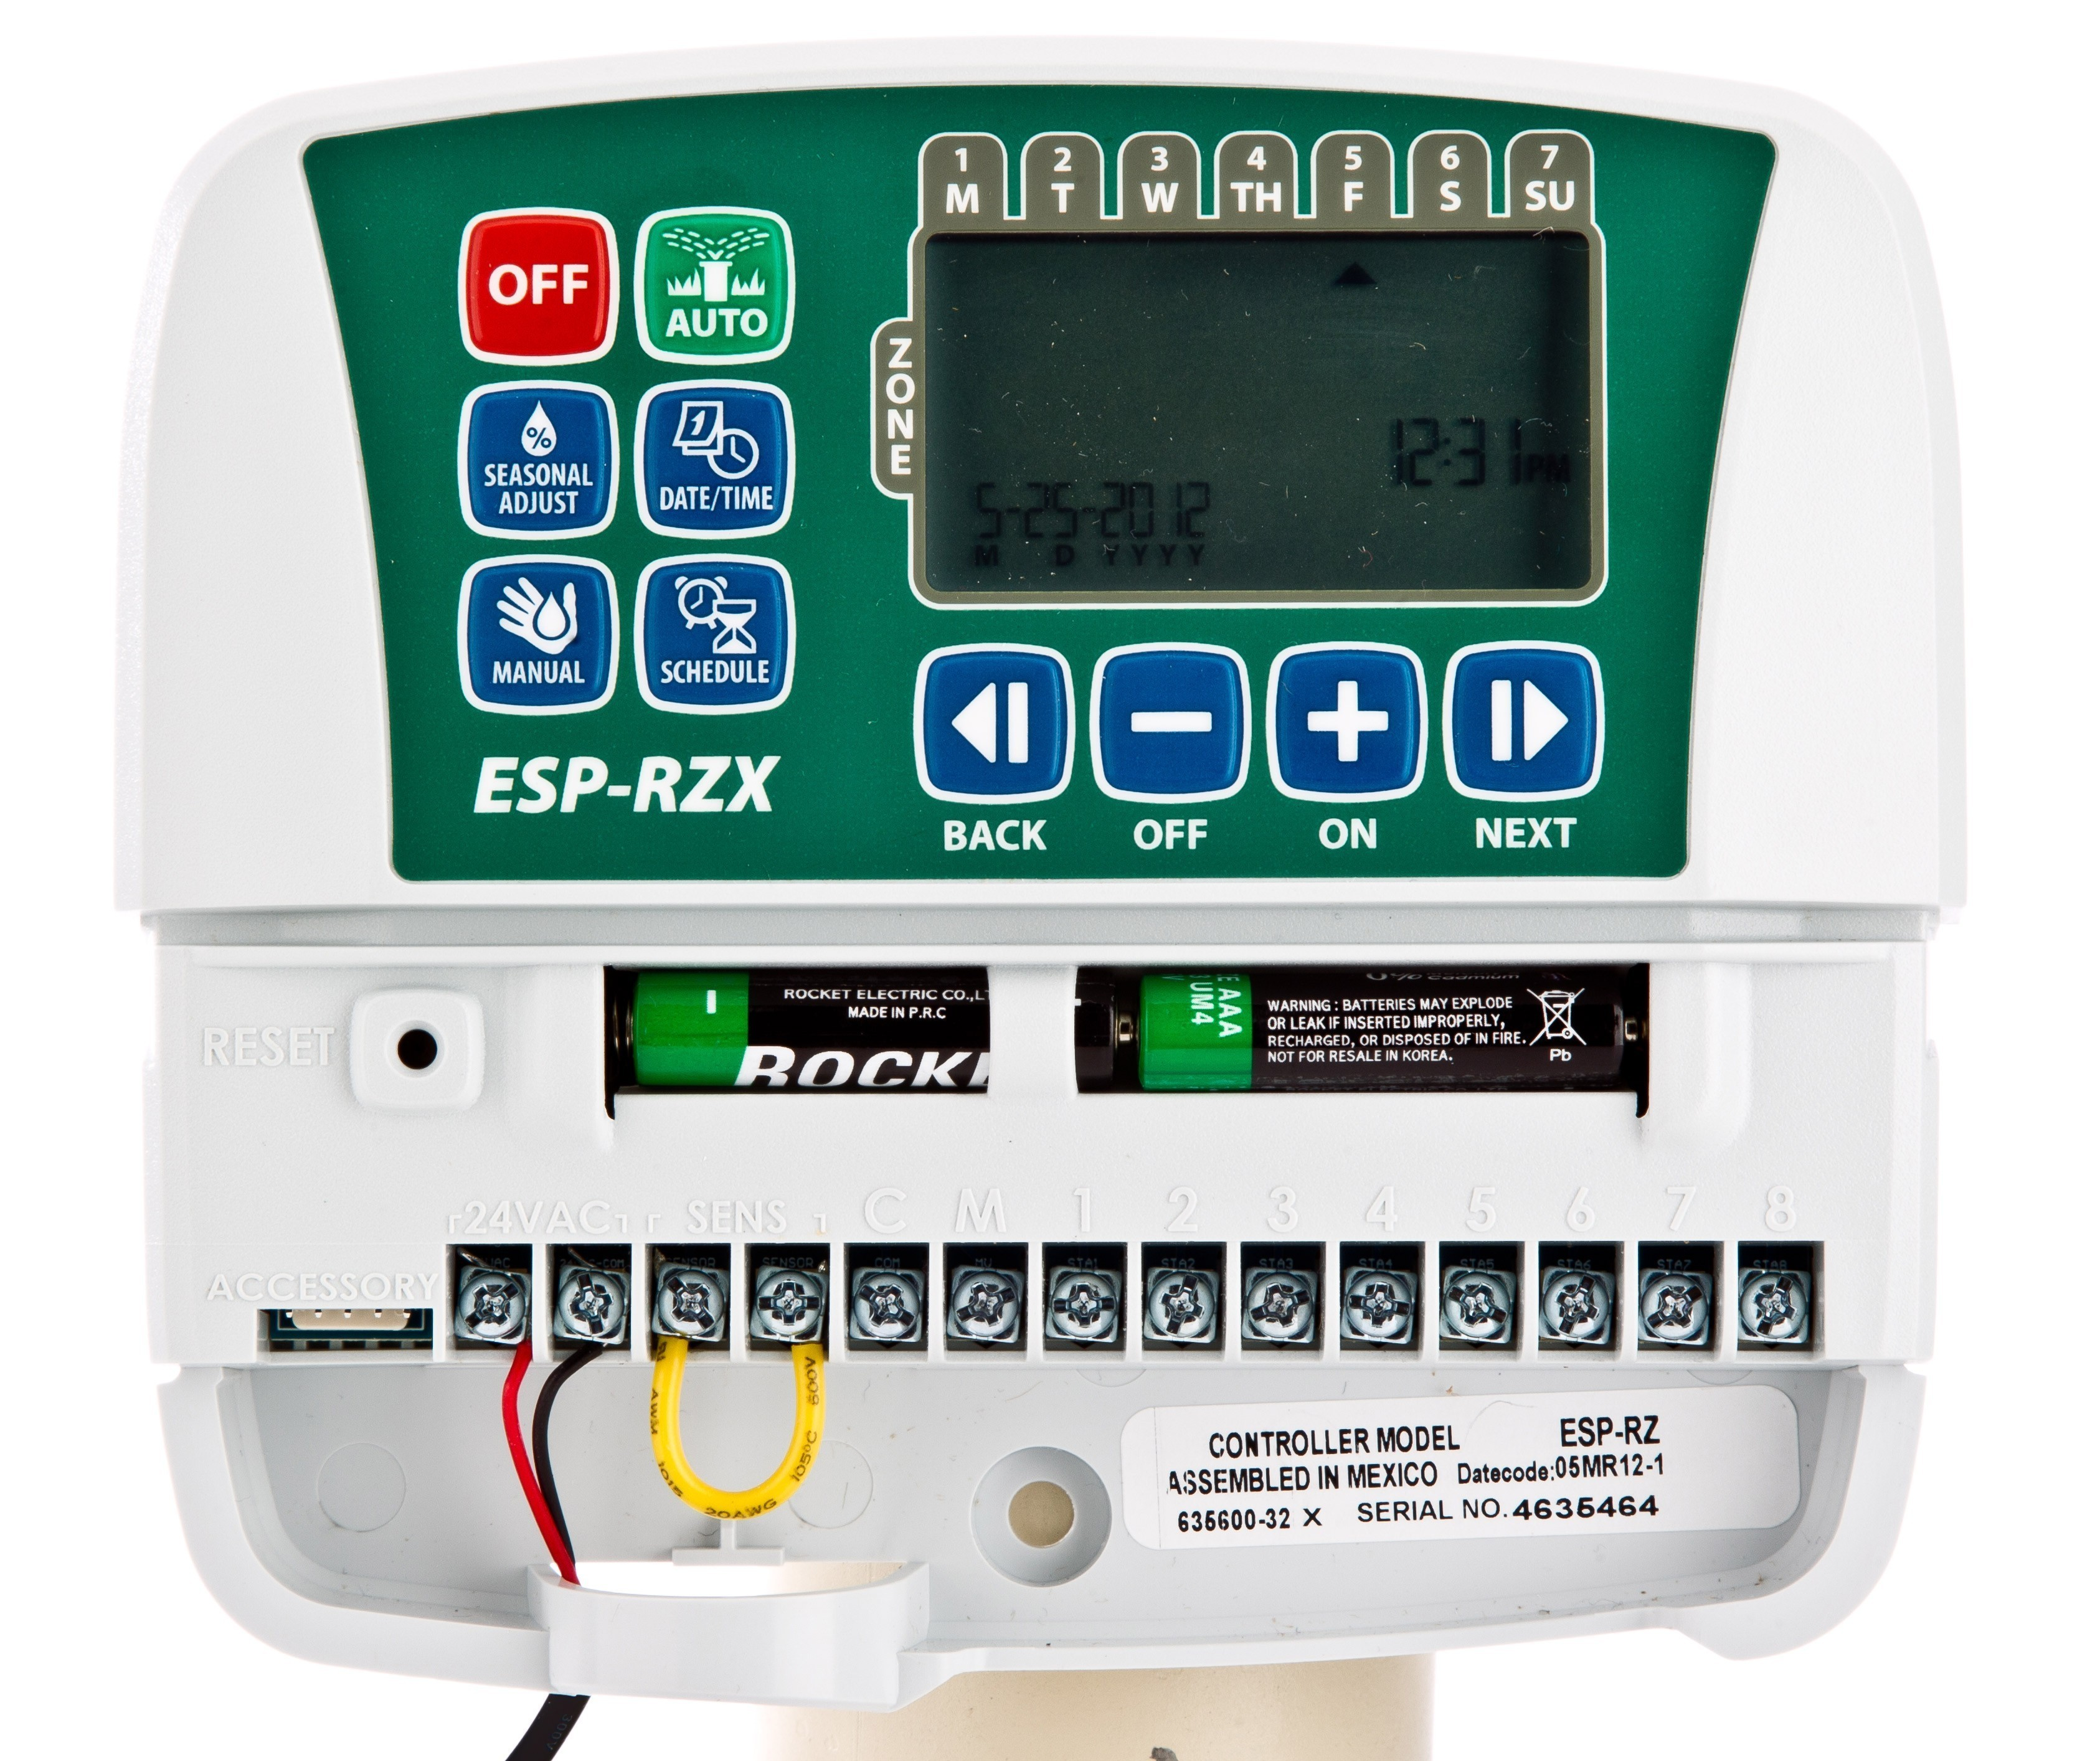 Rainbird Steuergerät ESP-RZX4i 4 Stationen Innenmontage Bild 2